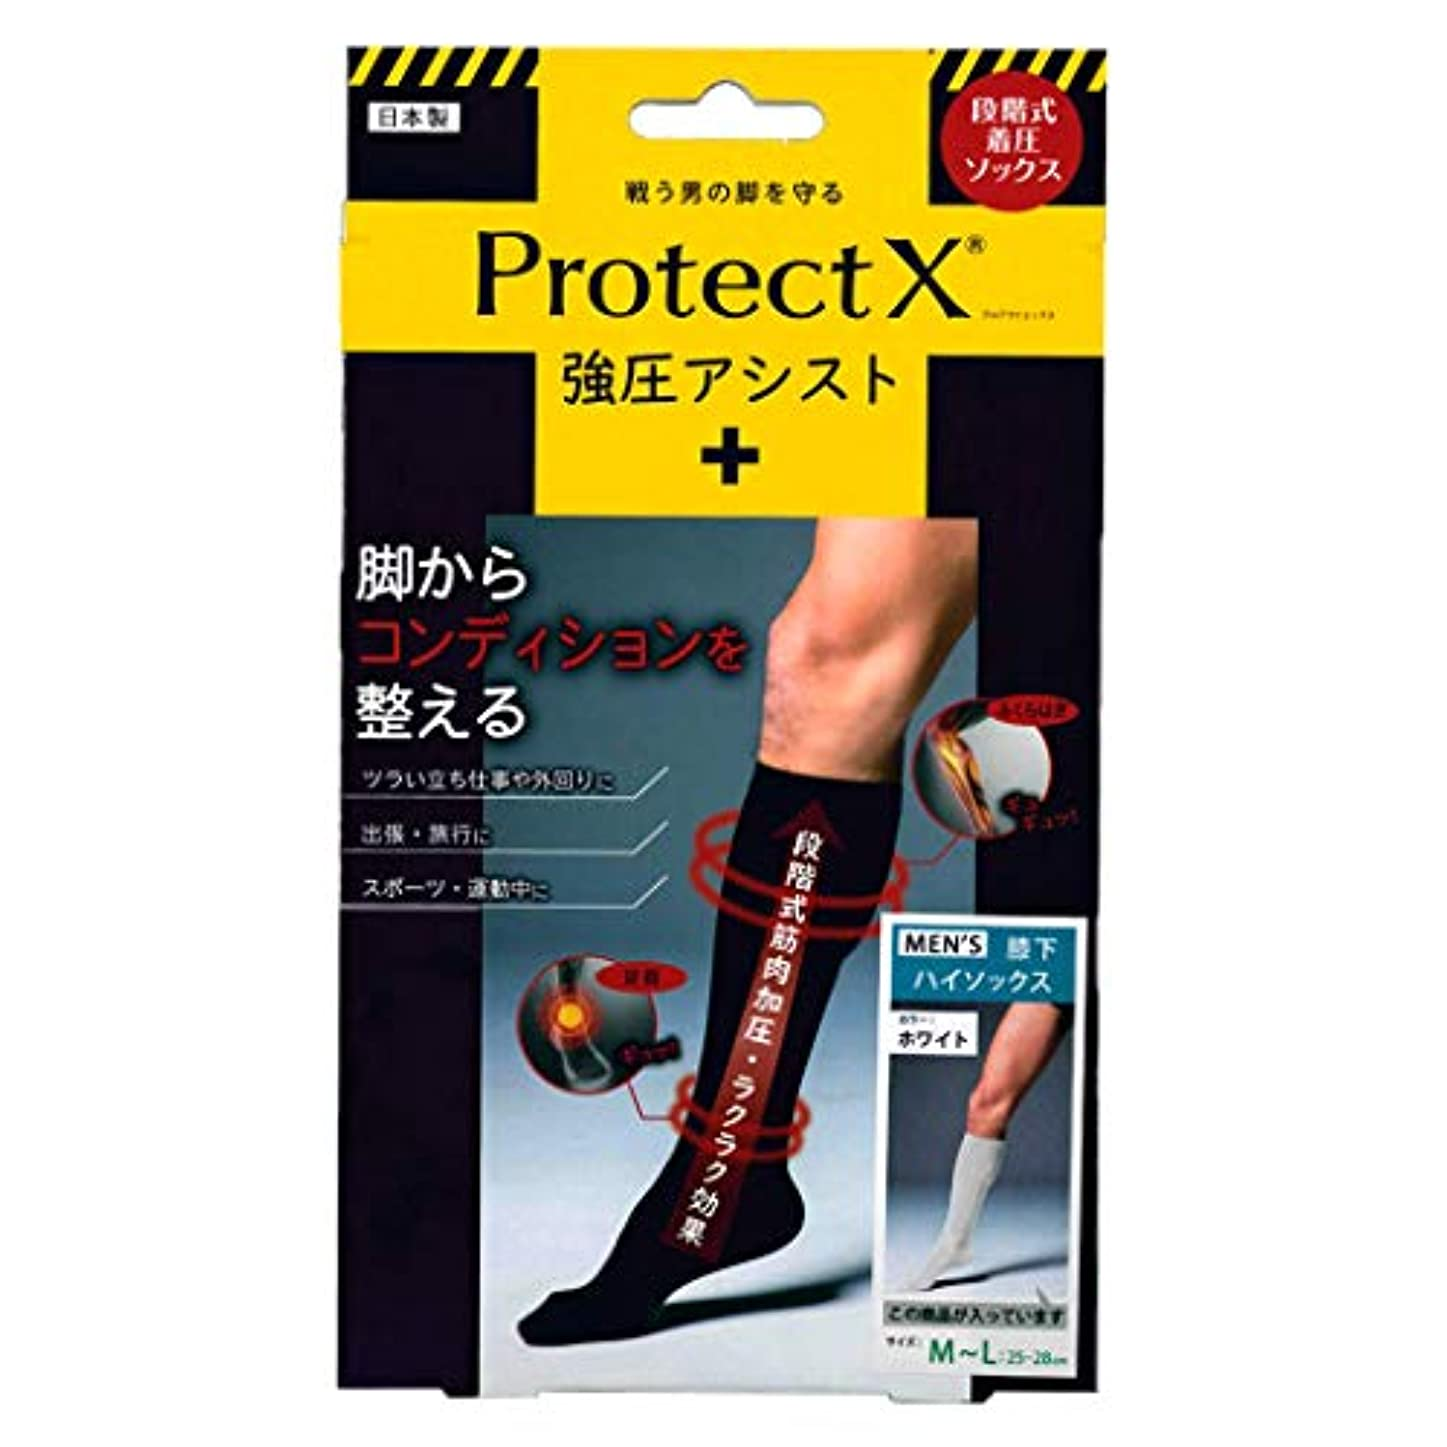 Protect X(プロテクトエックス) 強圧アシスト つま先あり着圧ソックス 膝下 M-Lサイズ ホワイト